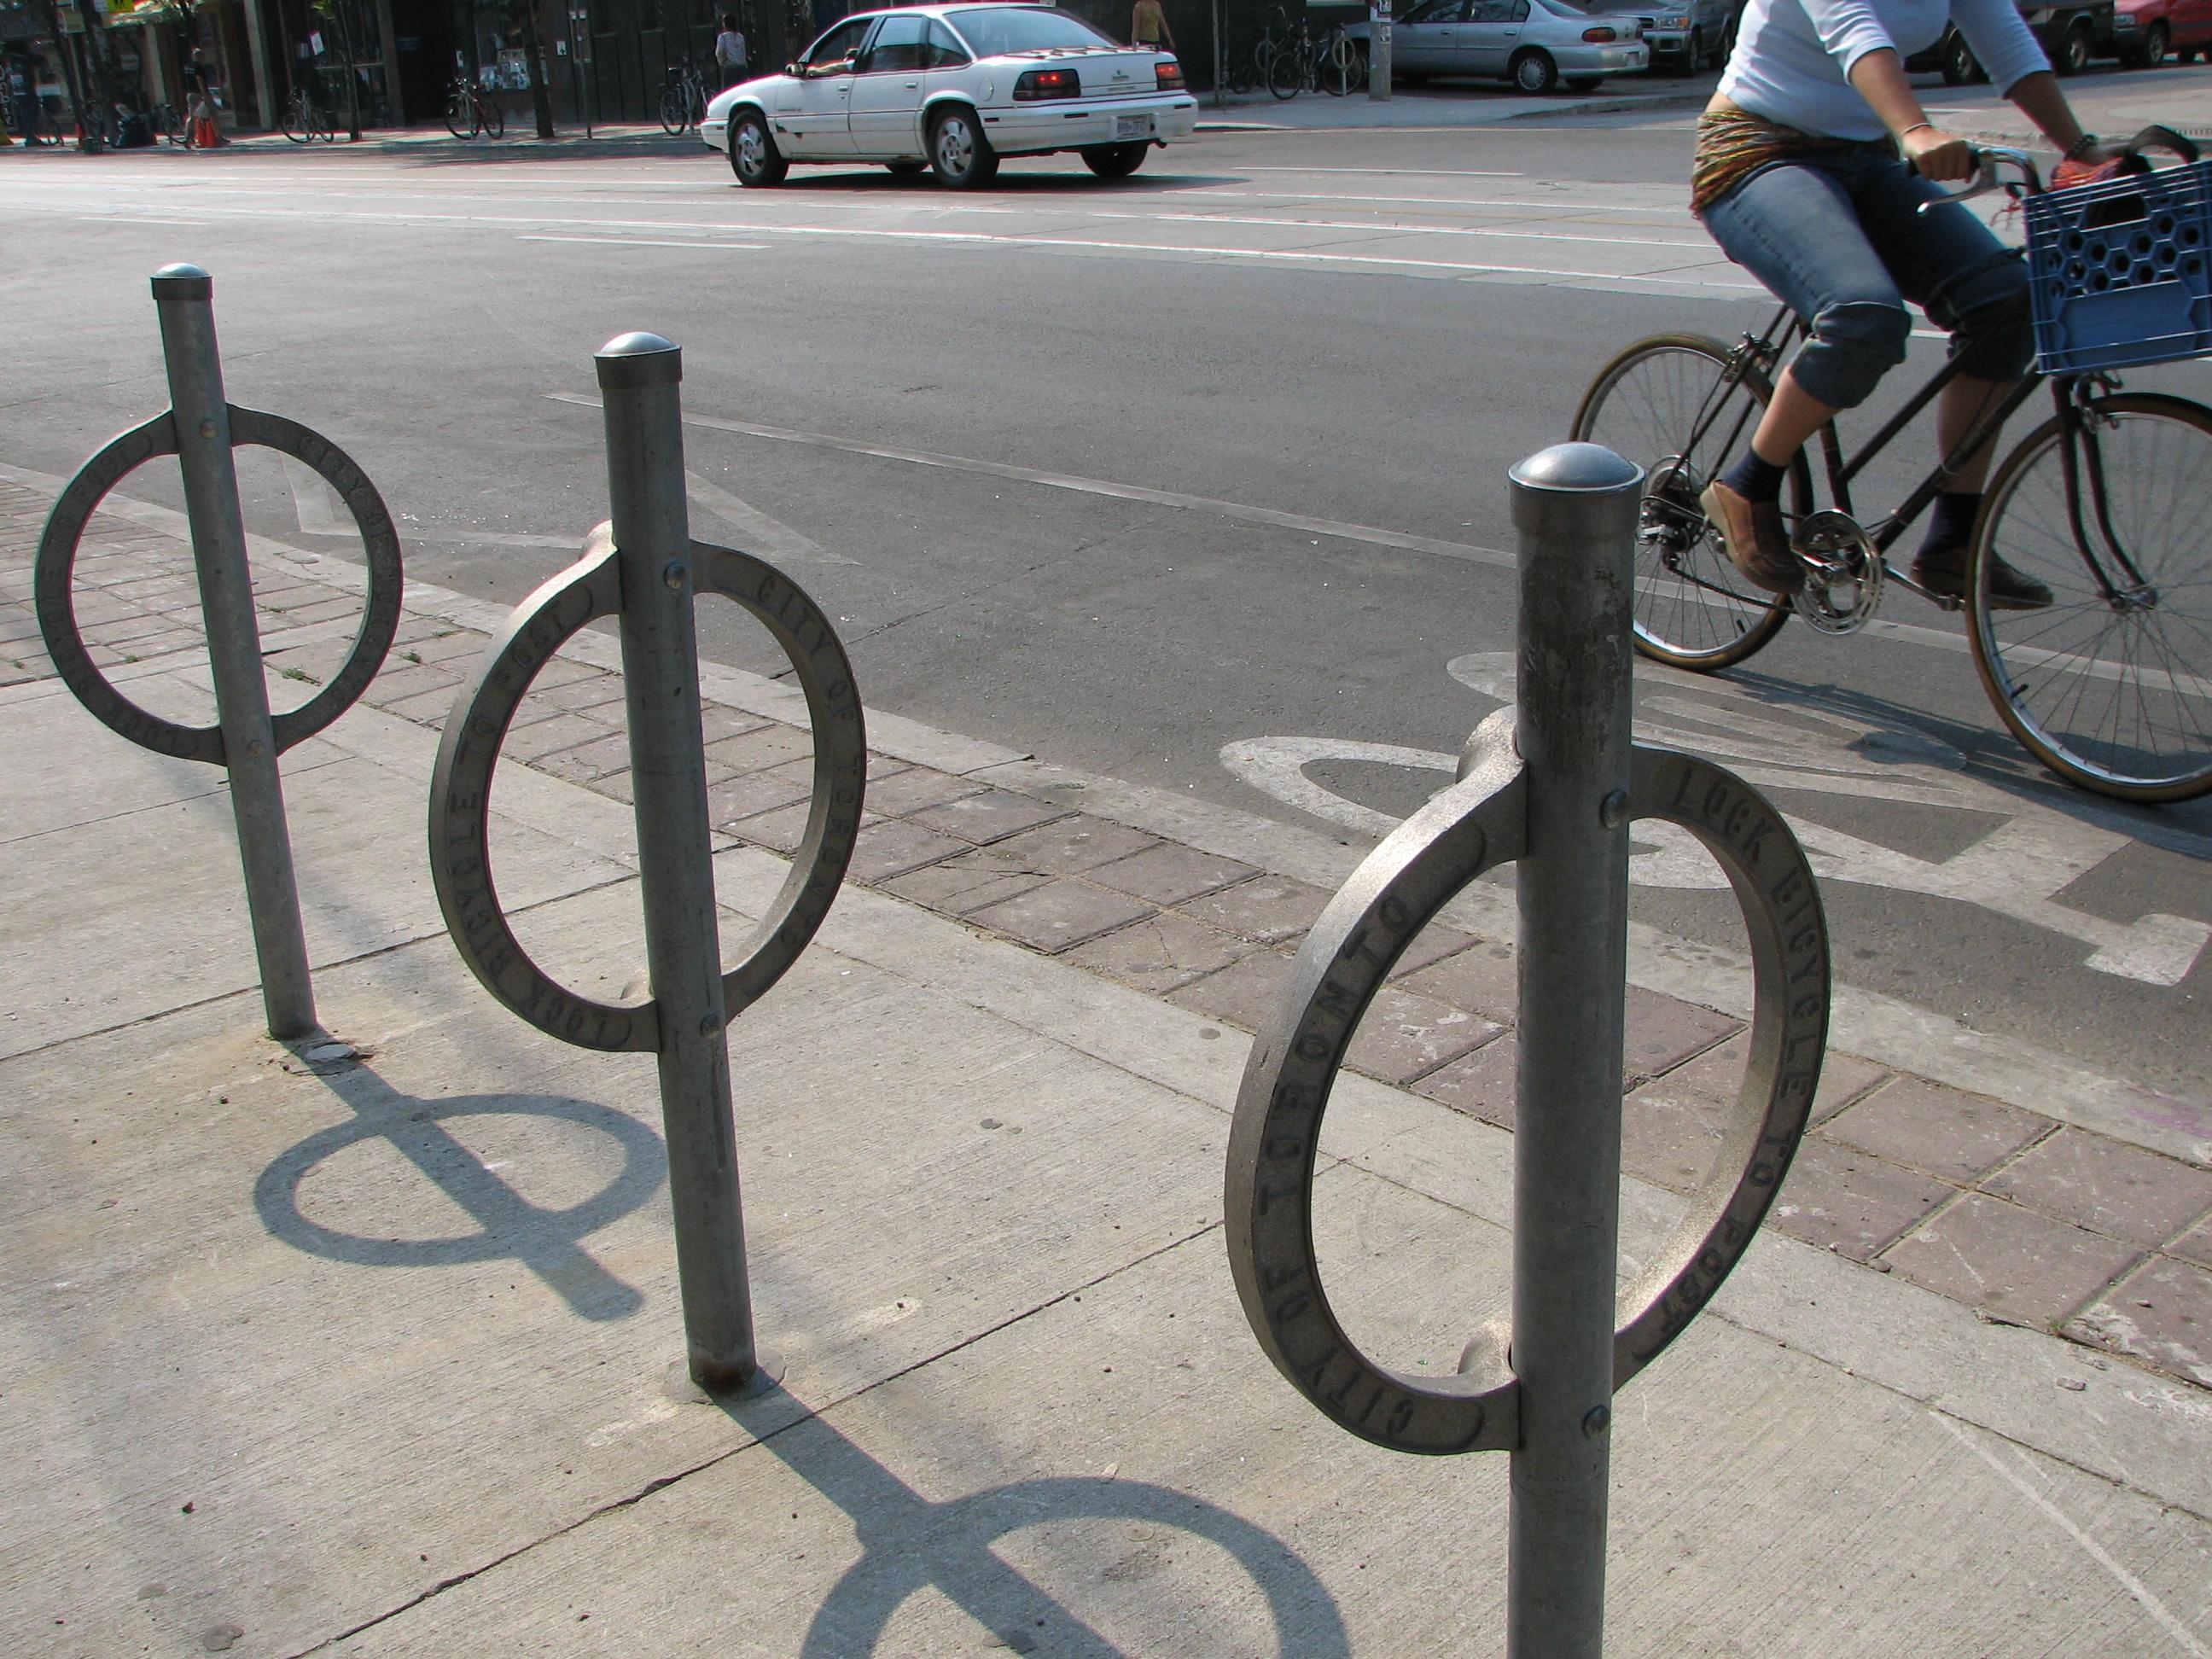 File:Bike path on College in Toronto.jpeg - Wikimedia Commons